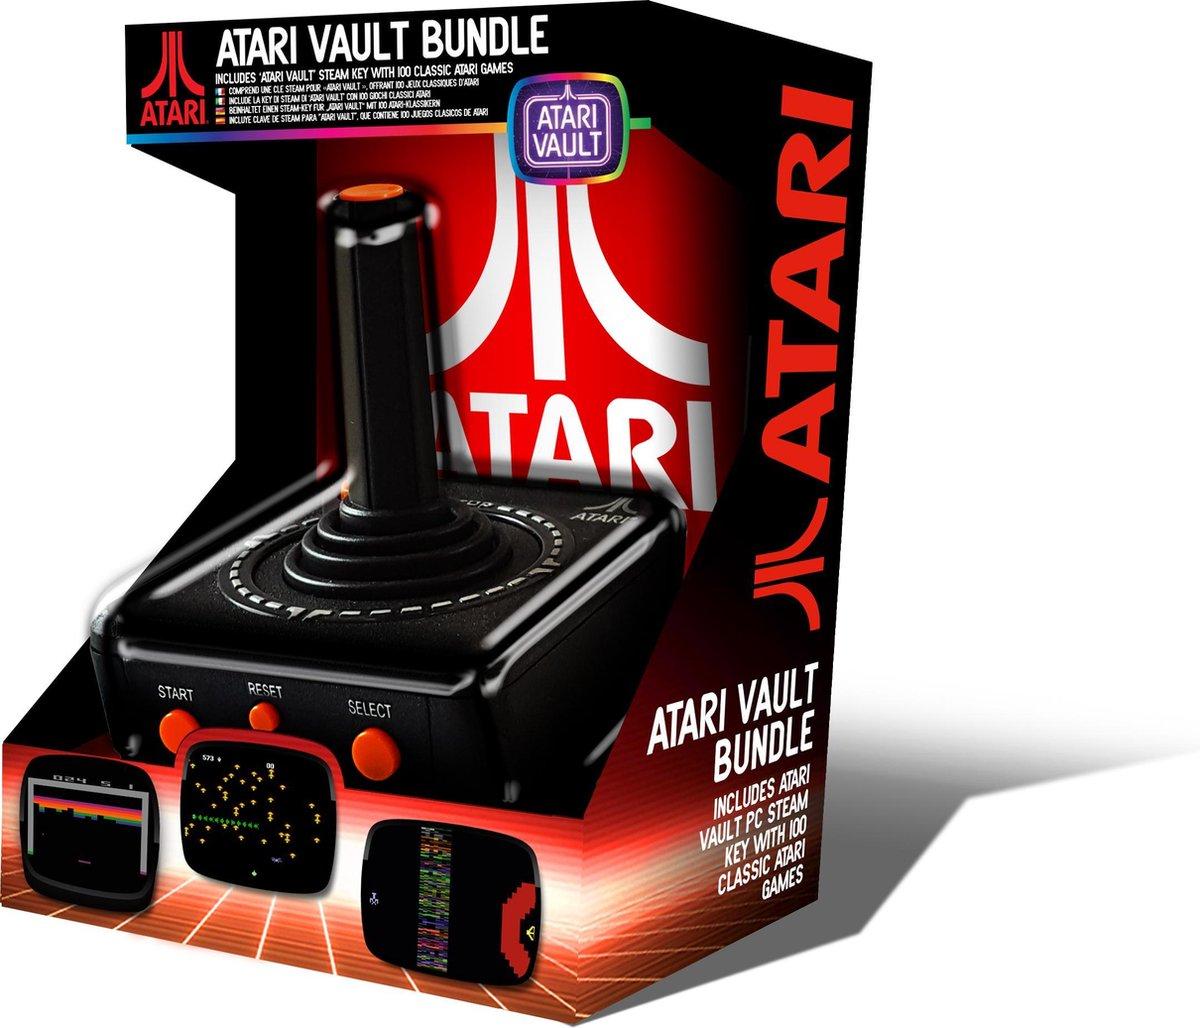 Atari Retro PC USB Joystick   Vault Bundle (100 games)